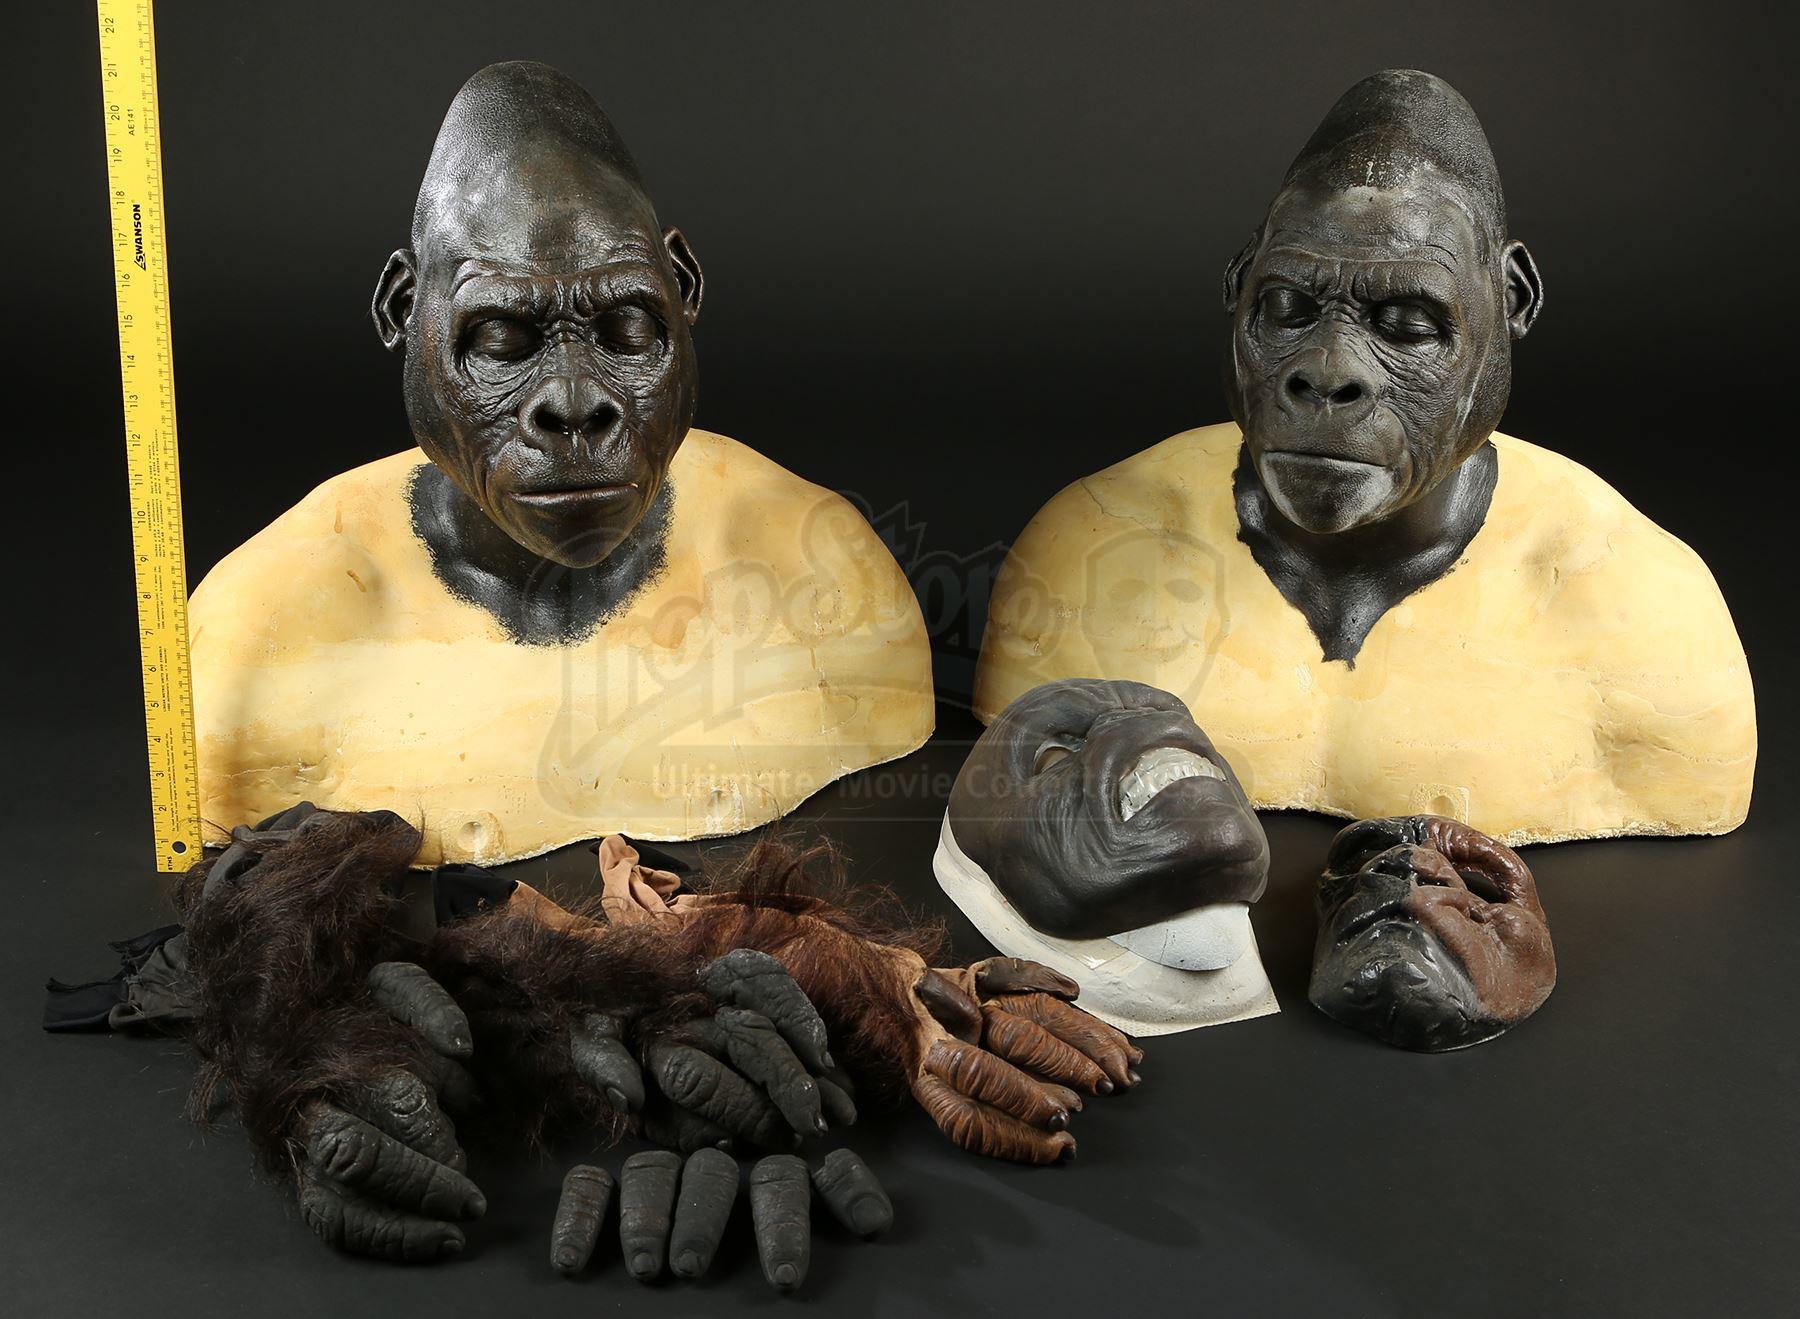 Apes test